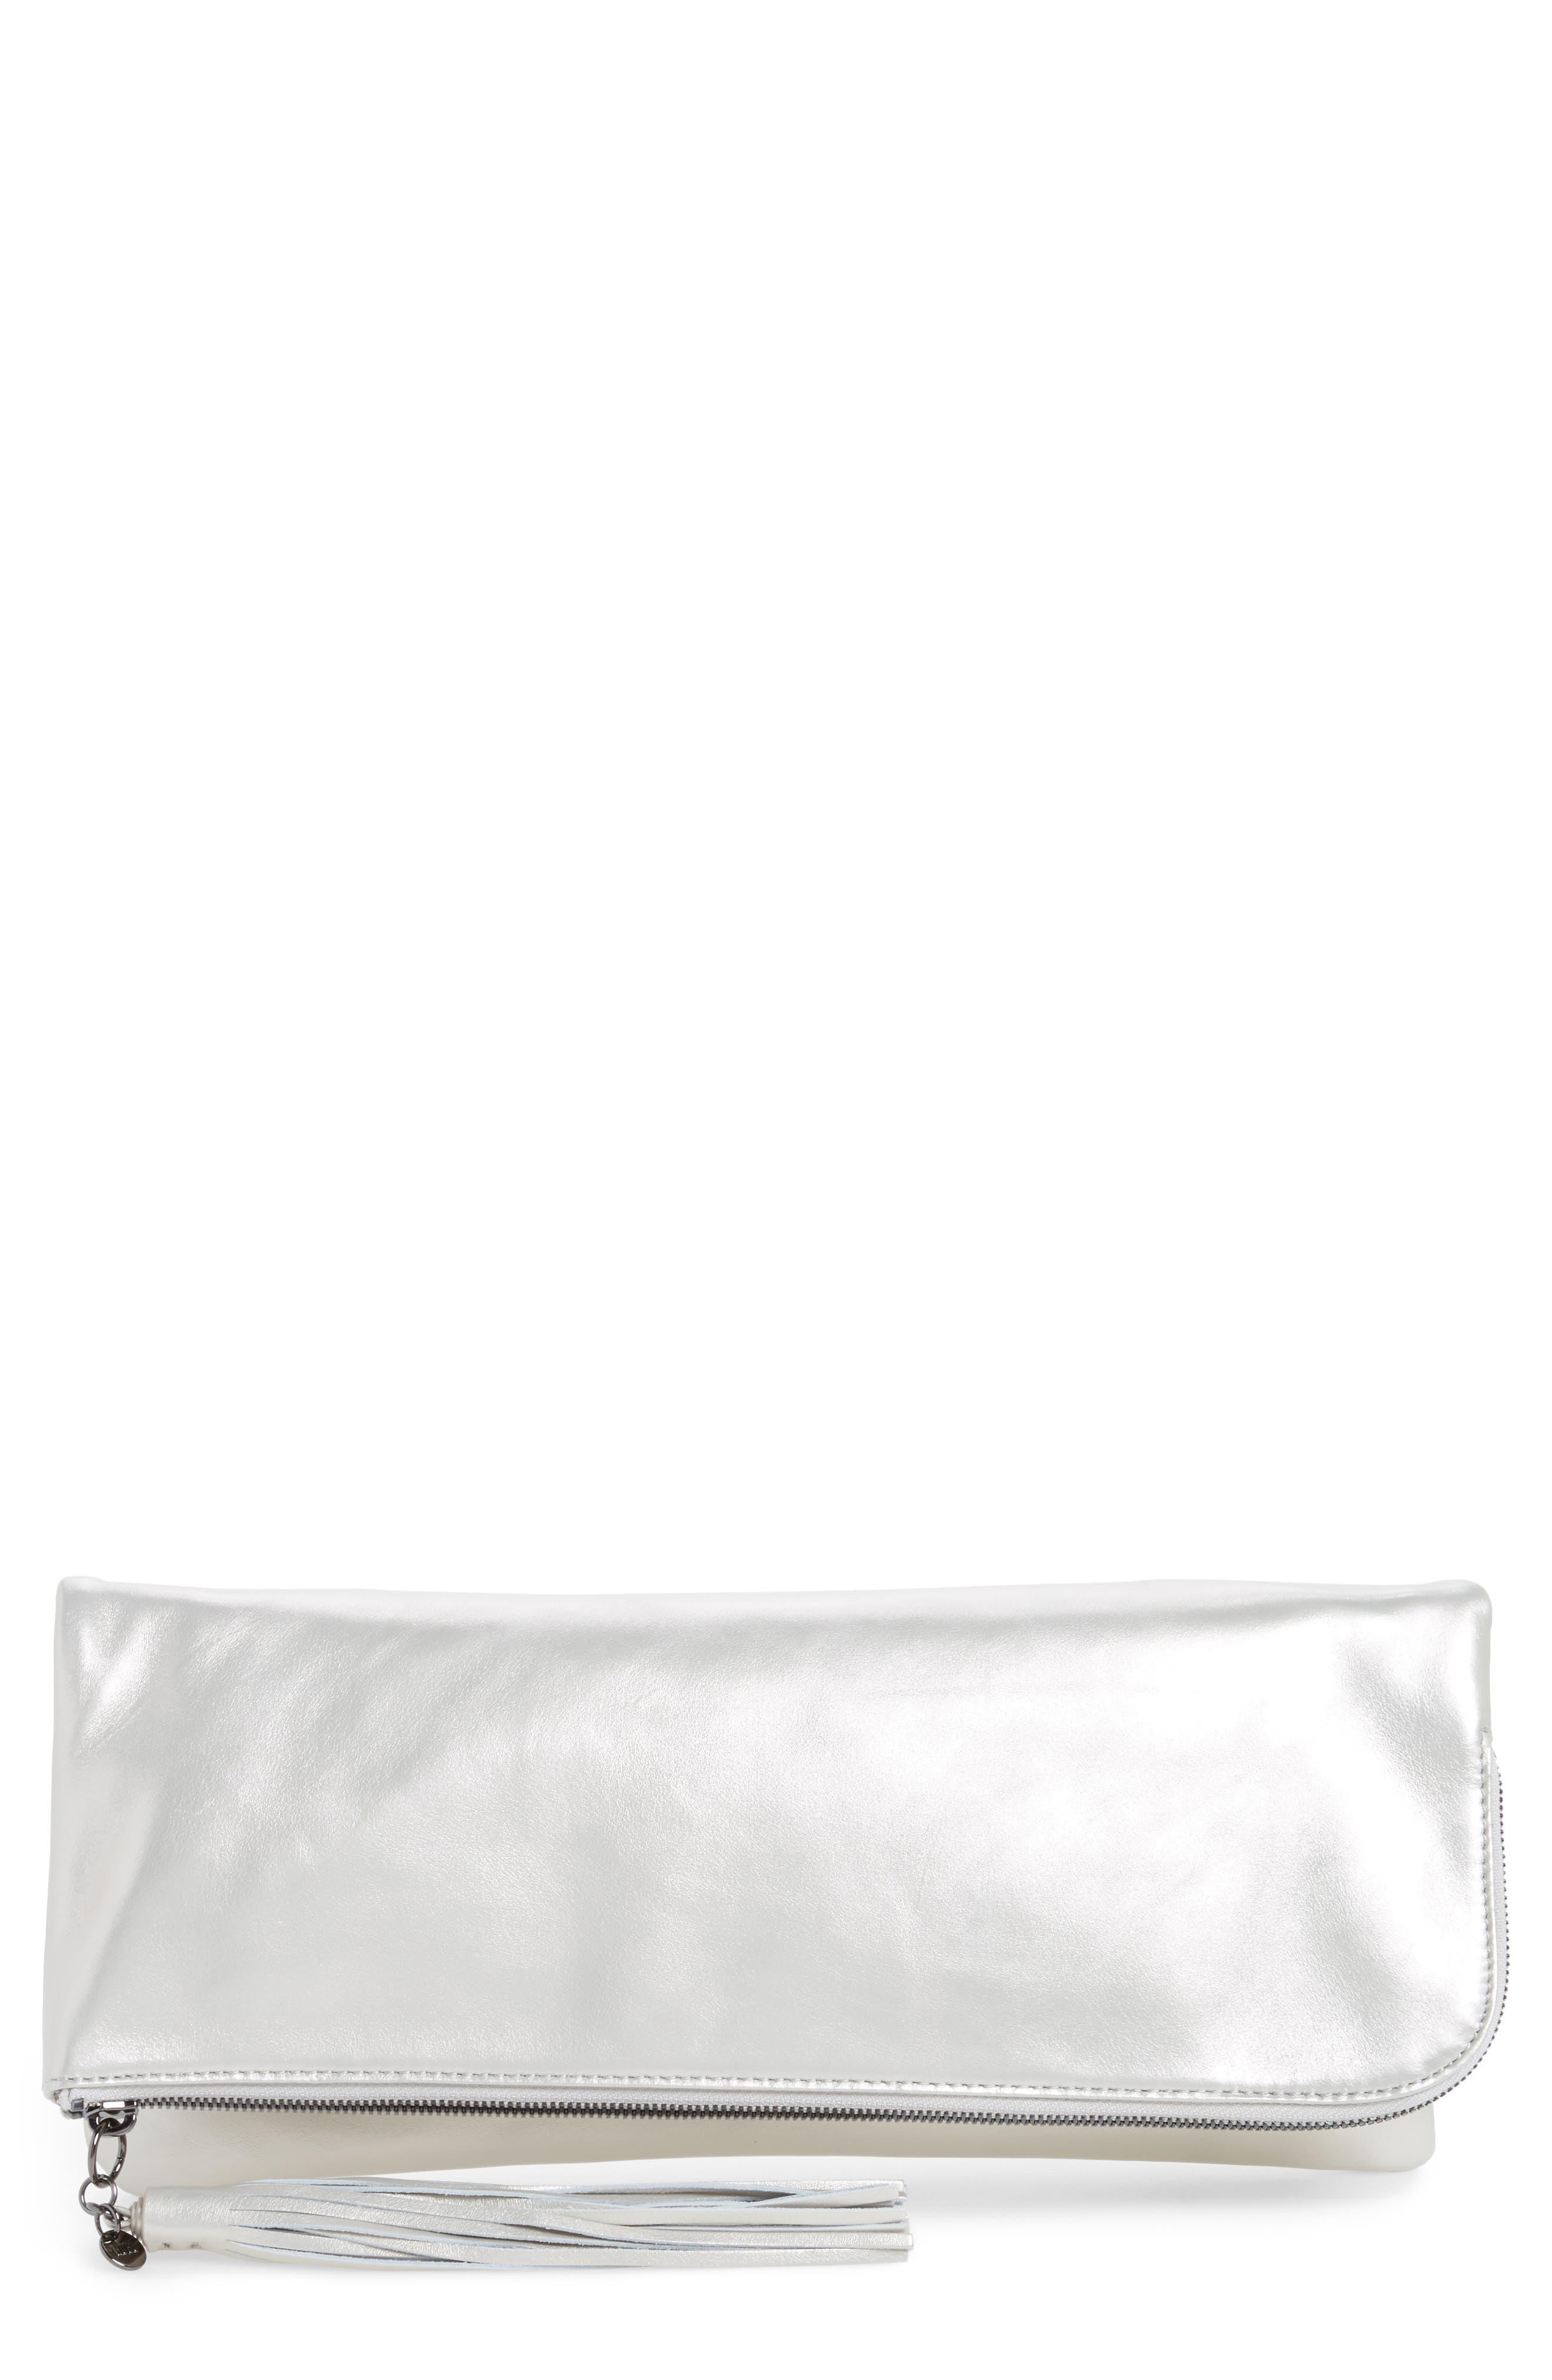 Alternate Image 1 Selected - Hobo Raine Calfskin Leather Foldover Clutch